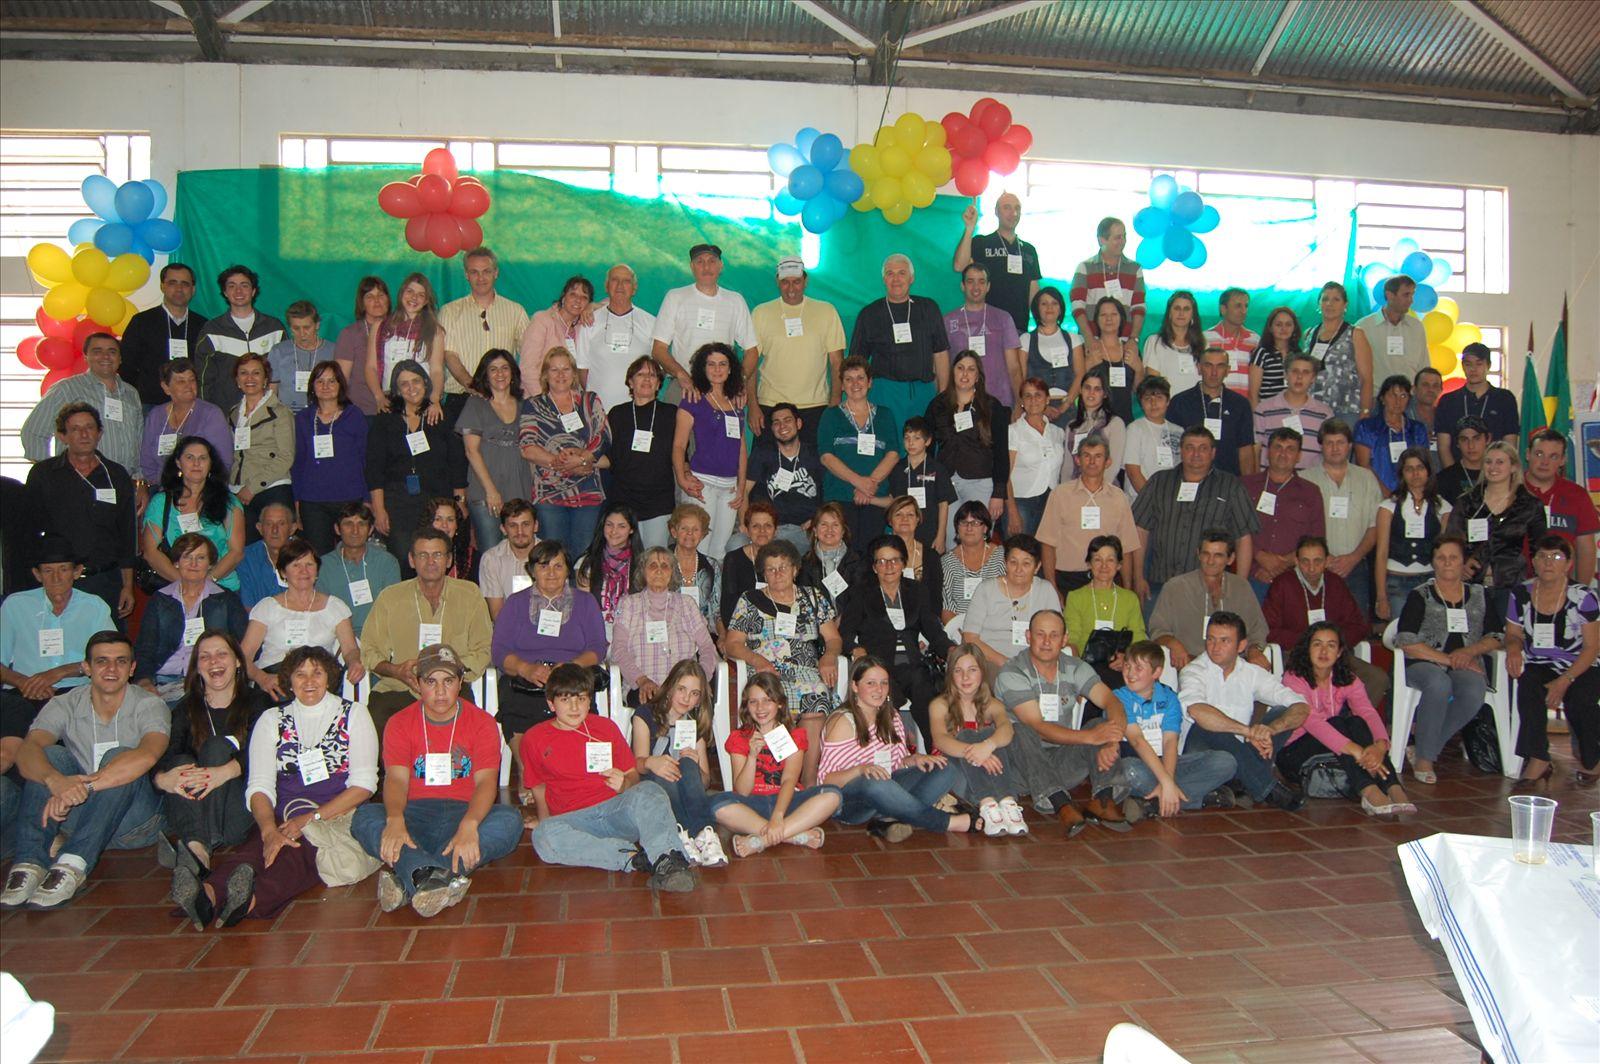 2º Encontro Família Cornelli - 11.10.2009 (159)_0